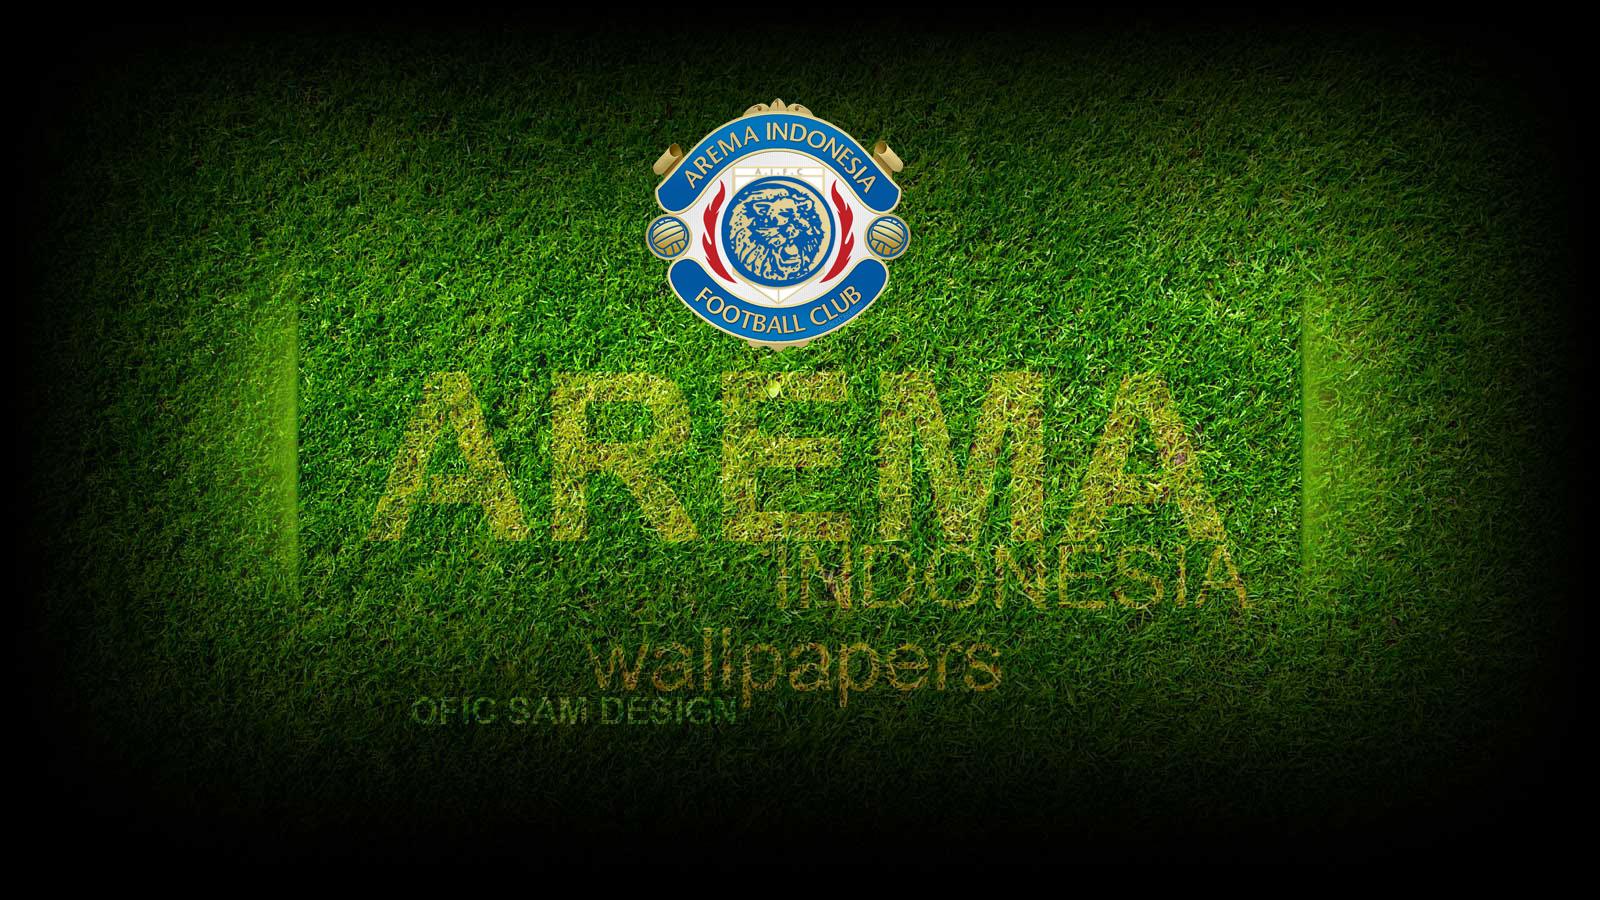 http://4.bp.blogspot.com/-ANvqQzt0__k/TlCByrfiZNI/AAAAAAAAAfA/tXXeY05Kswg/s1600/by+Ofic+Sam+be+partner+AREMA+INDONESIA+wallpapers.jpg